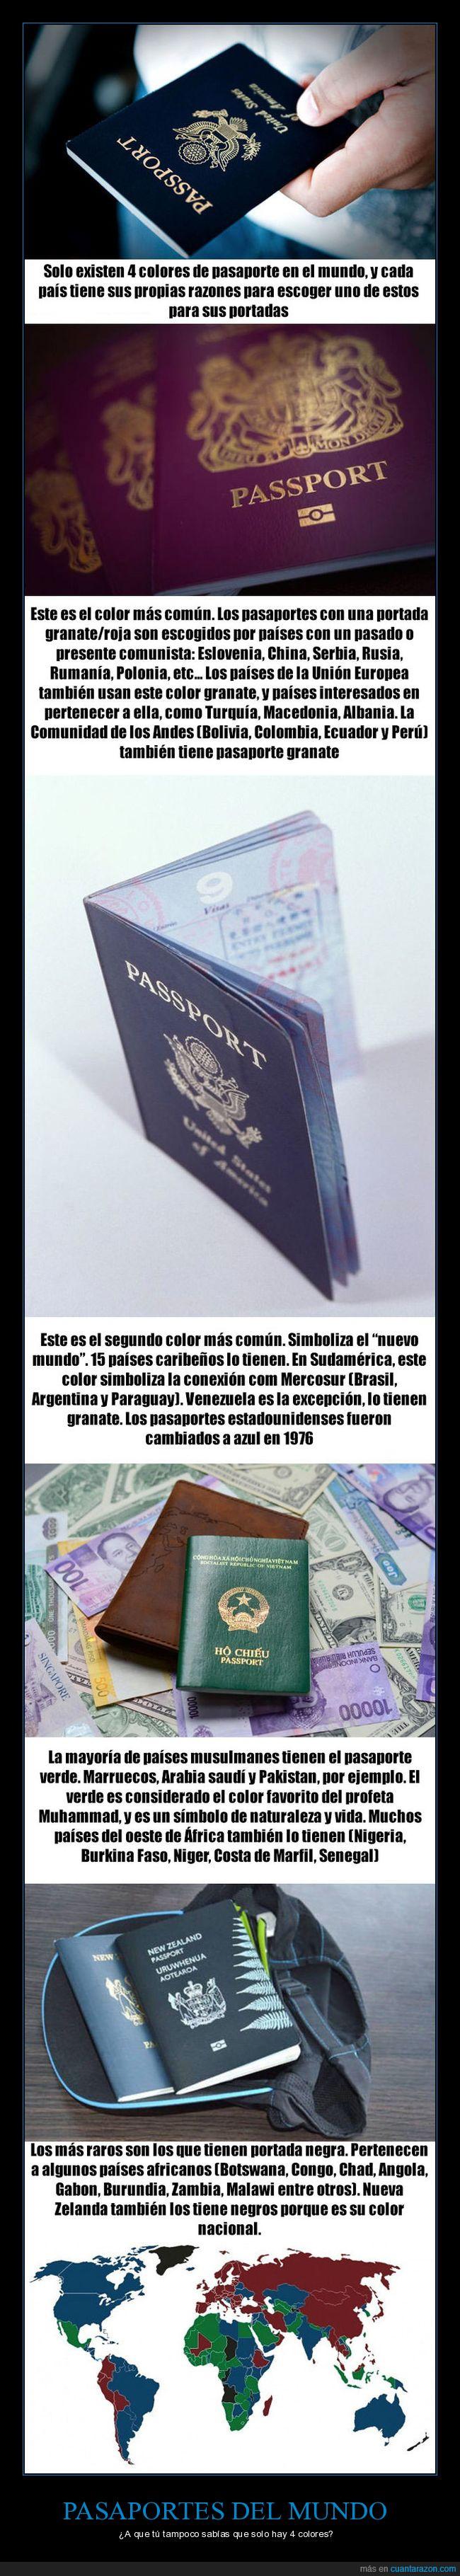 colores,países,pasaportes